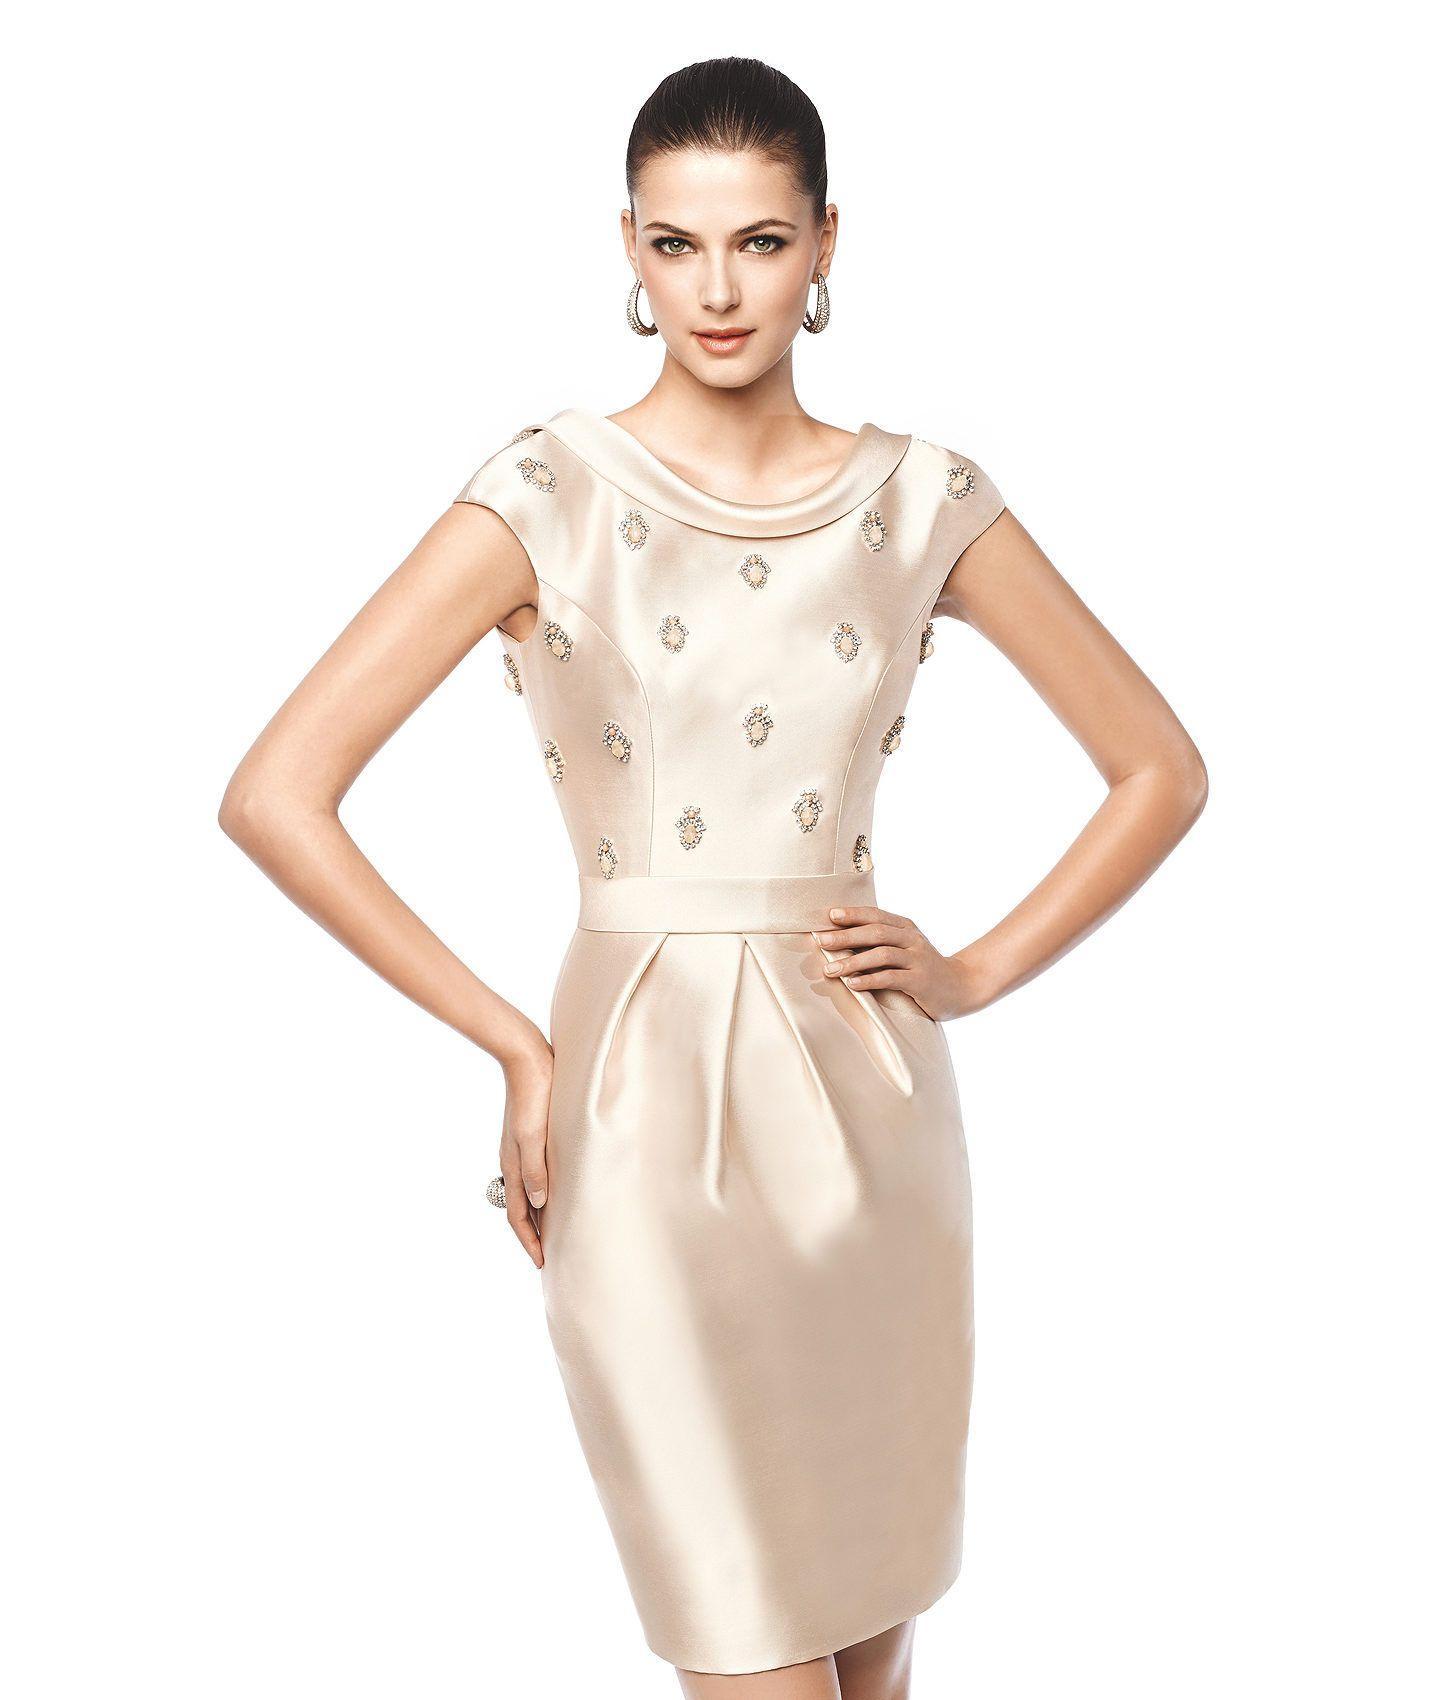 37b2b13c3 NAIARA - Vestido de fiesta corto (cóctel) color claro. Pronovias 2015